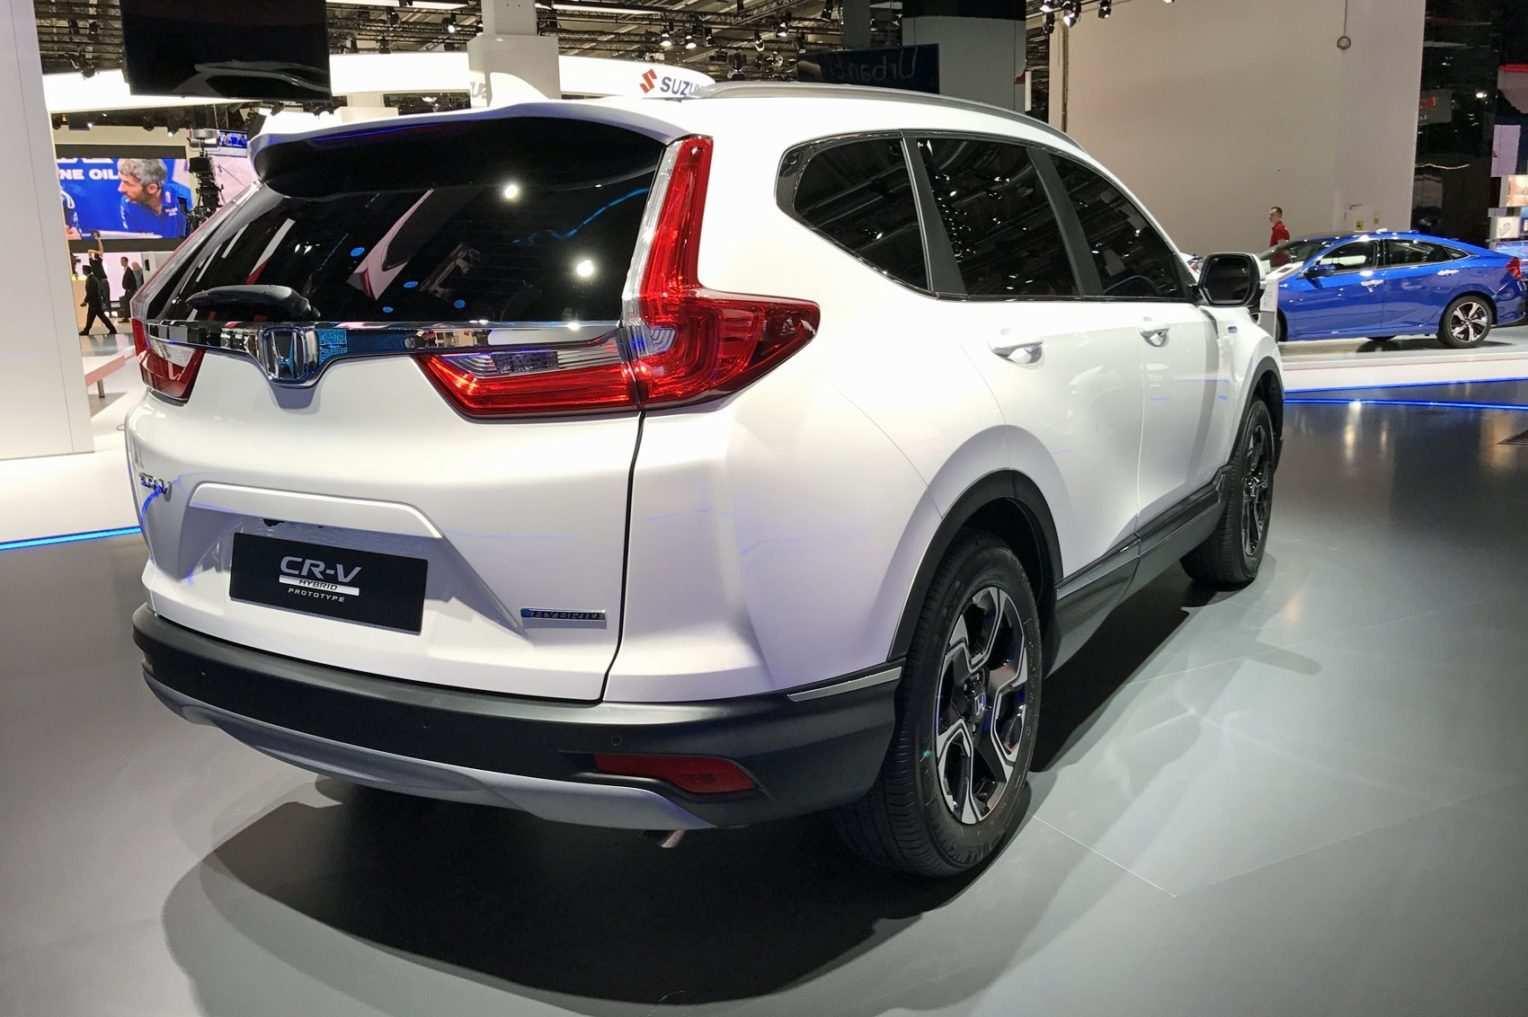 87 New Honda Crv 2020 Release Date with Honda Crv 2020